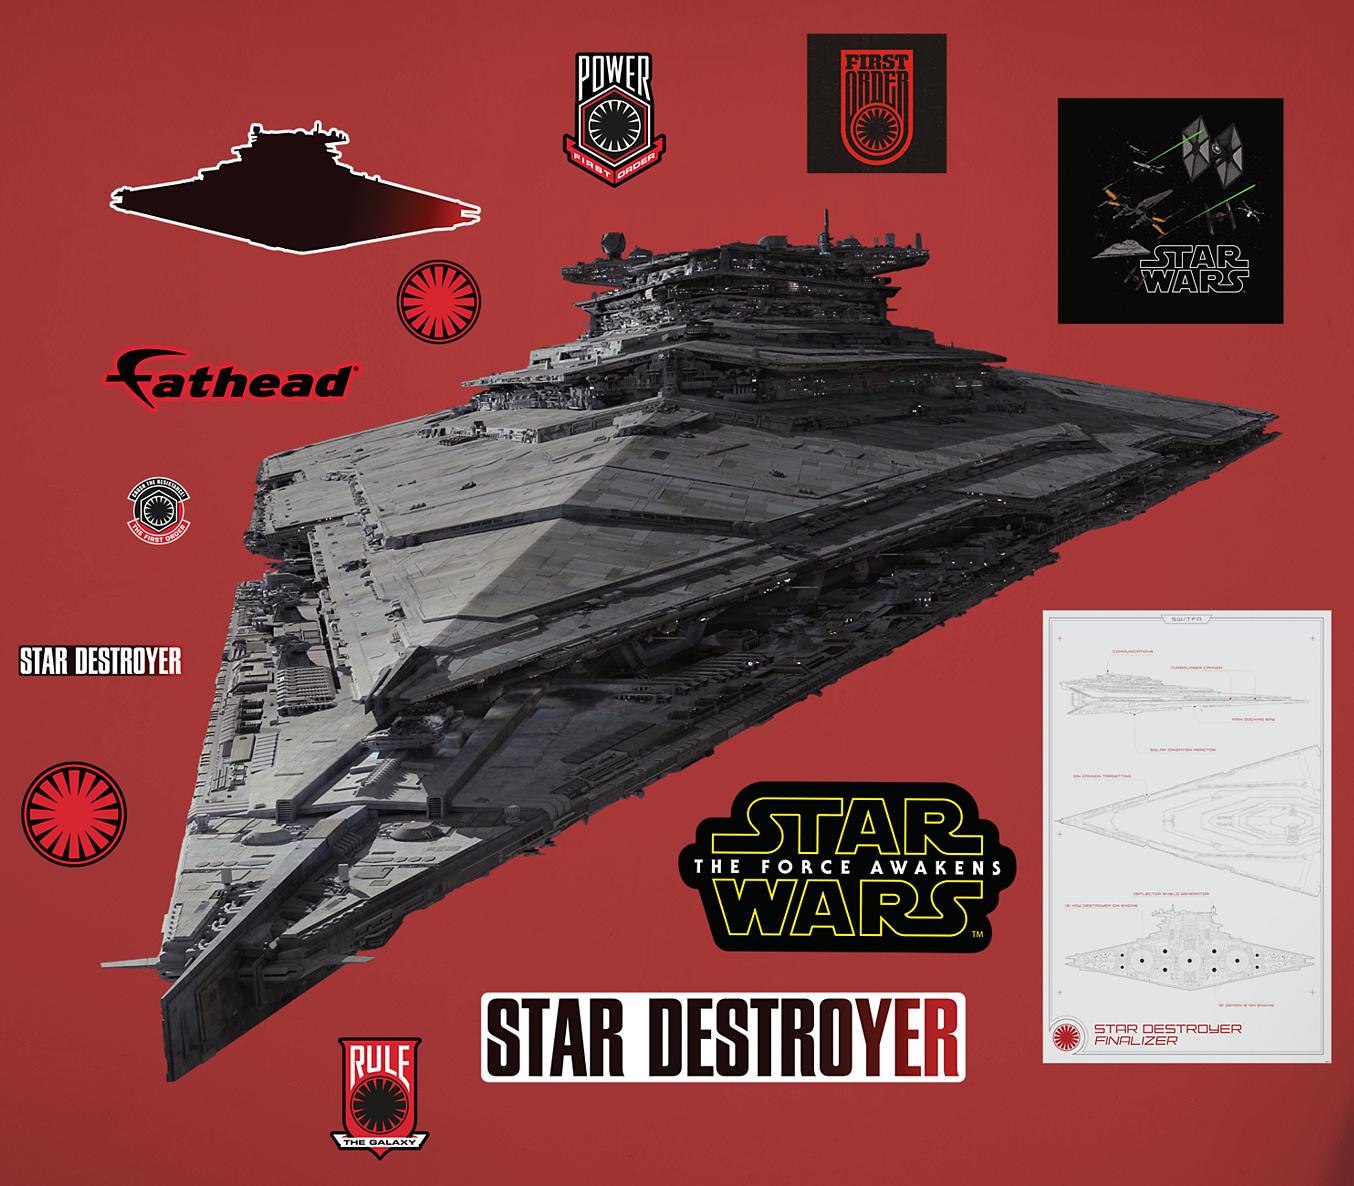 new images of u0027kylo ren u0027s u0027 command shuttle star destroyer u0026 more